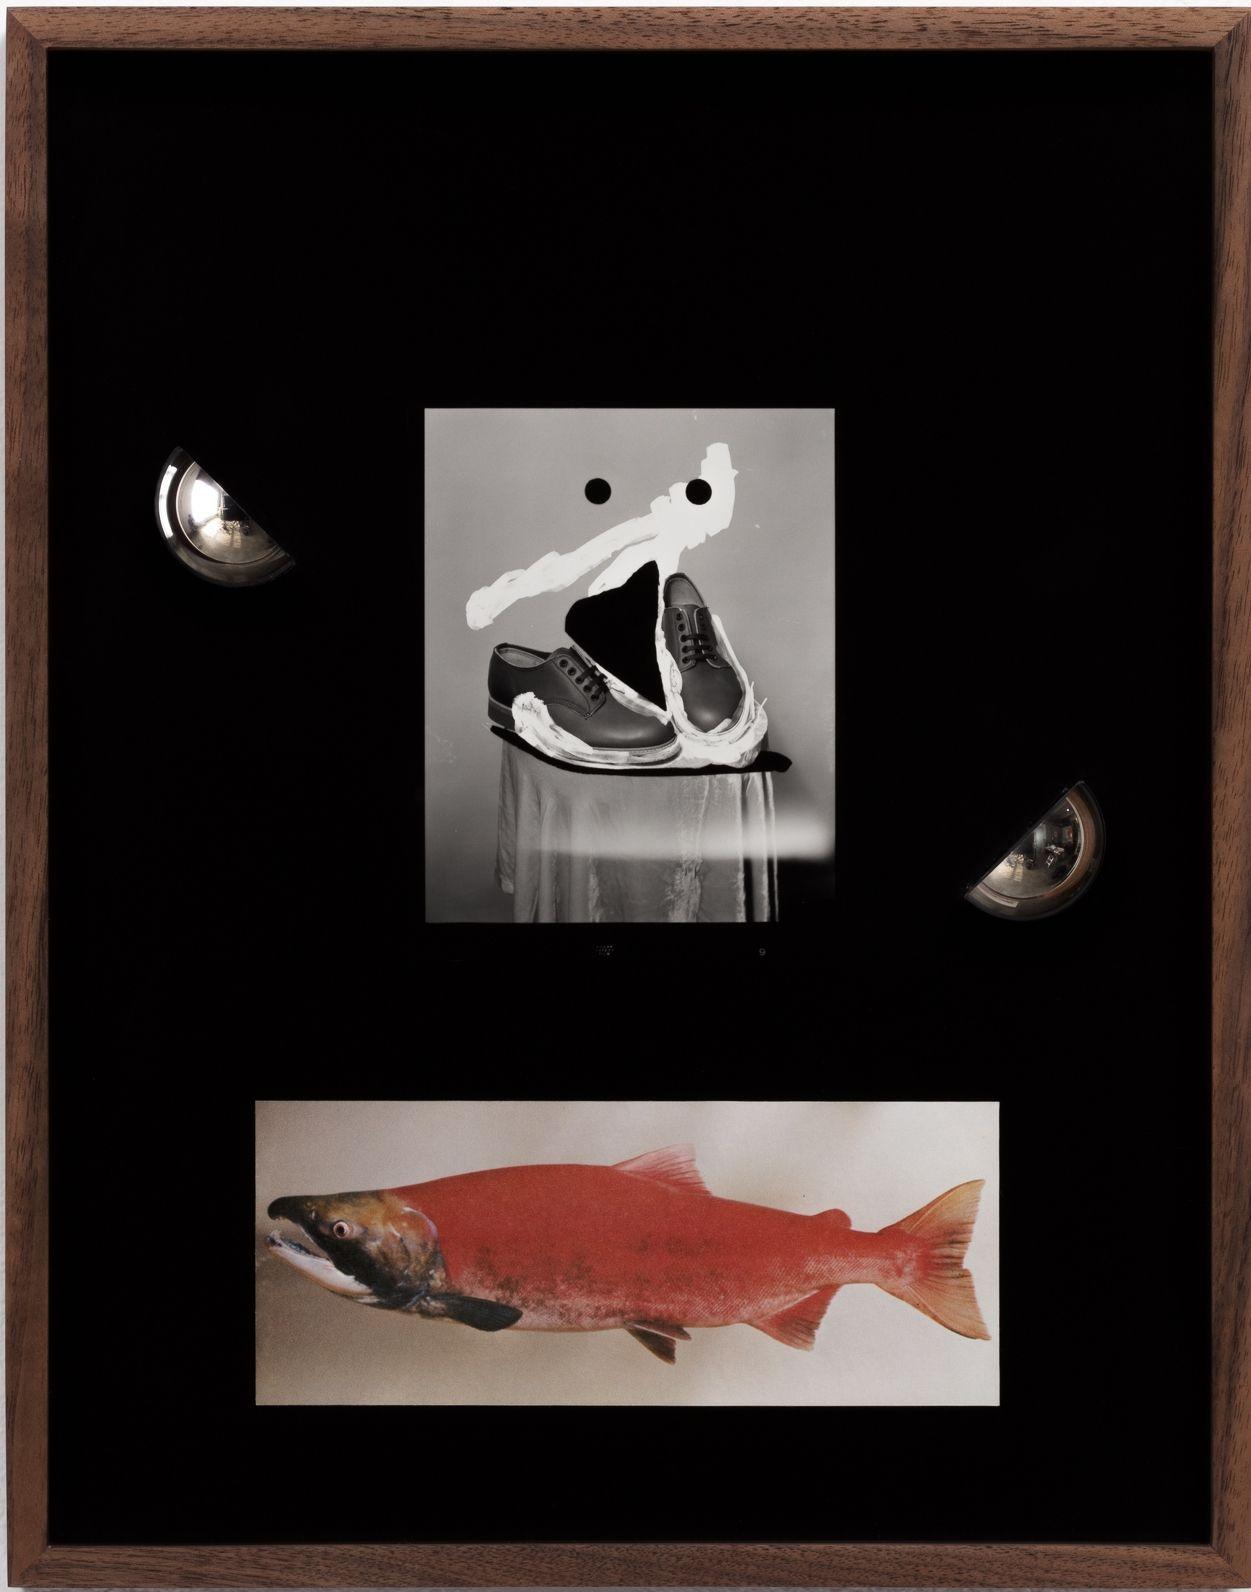 Elad Lassry, Untitled (Boots, Sockeye Salmon), 2018